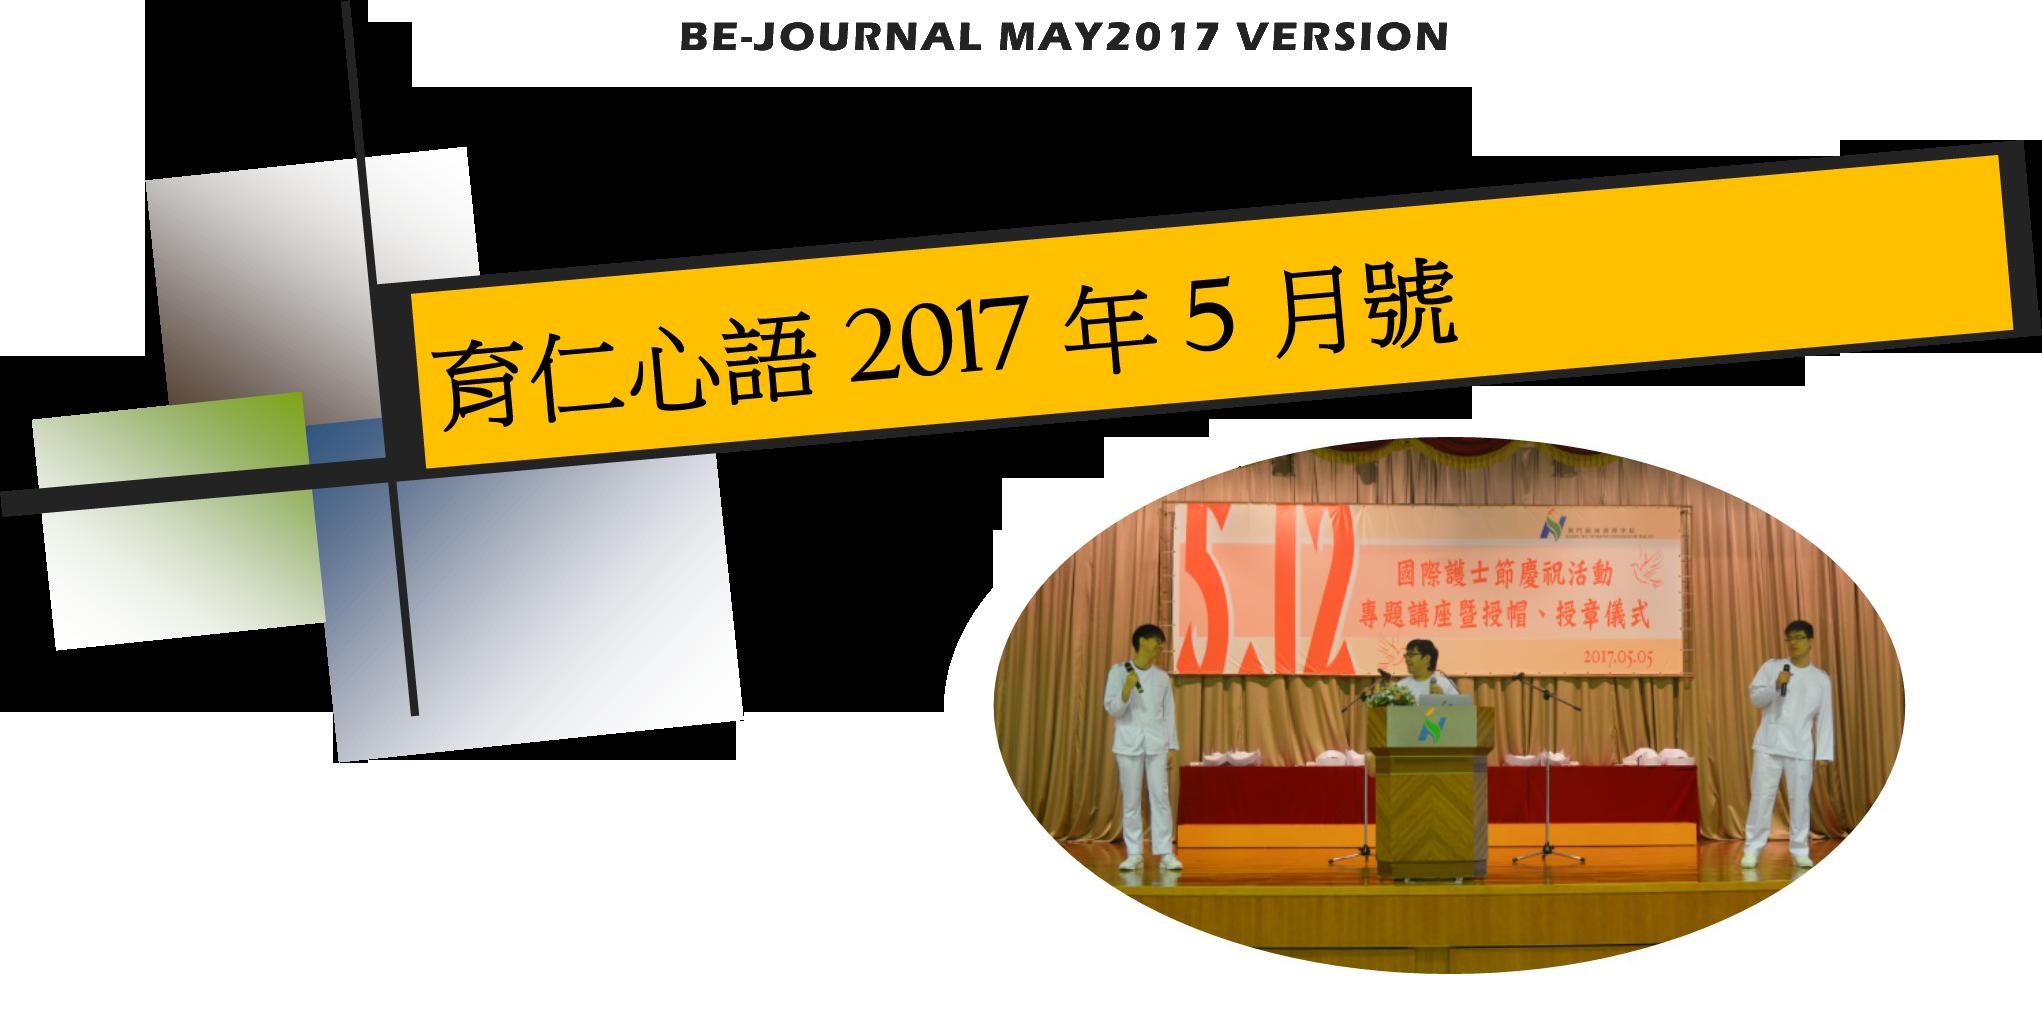 BEjournal4-201705